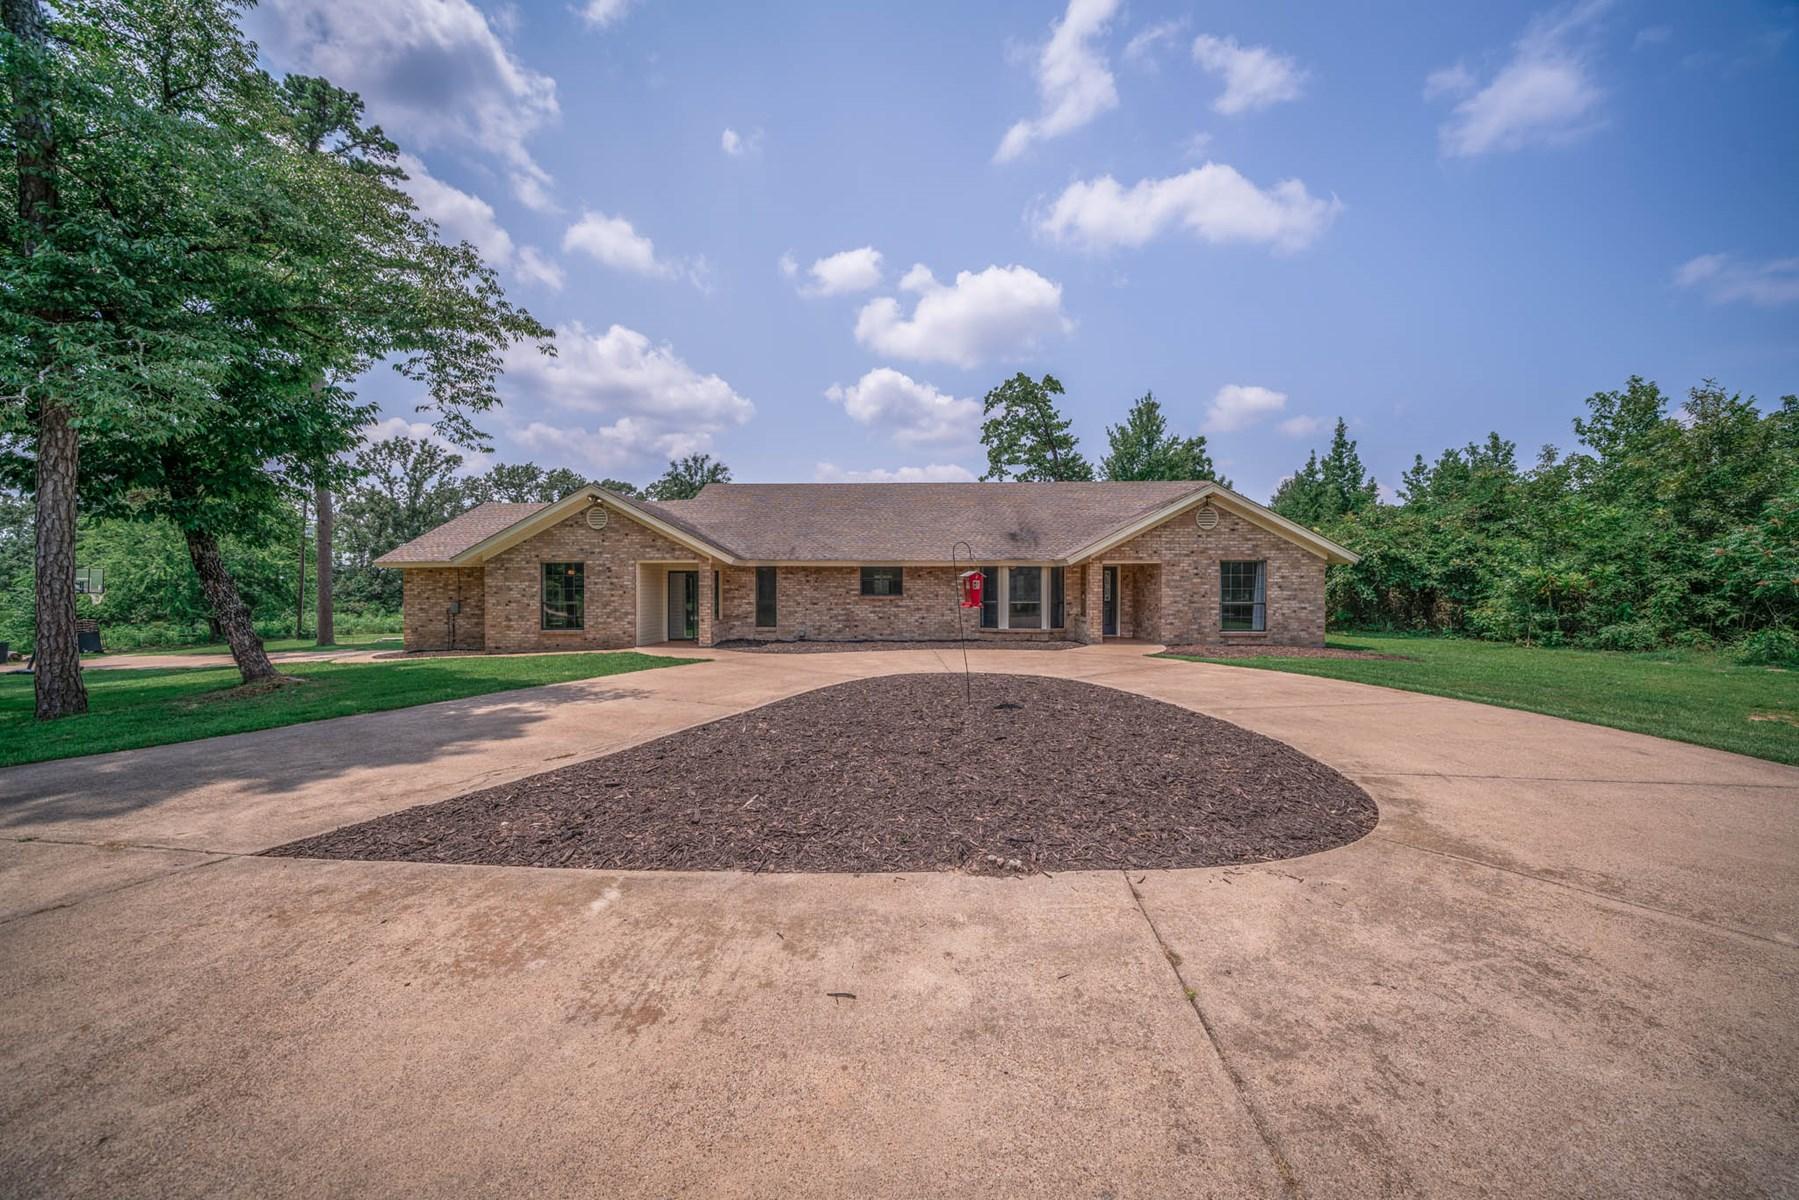 Harmony ISD Texas Home for sale on acreage